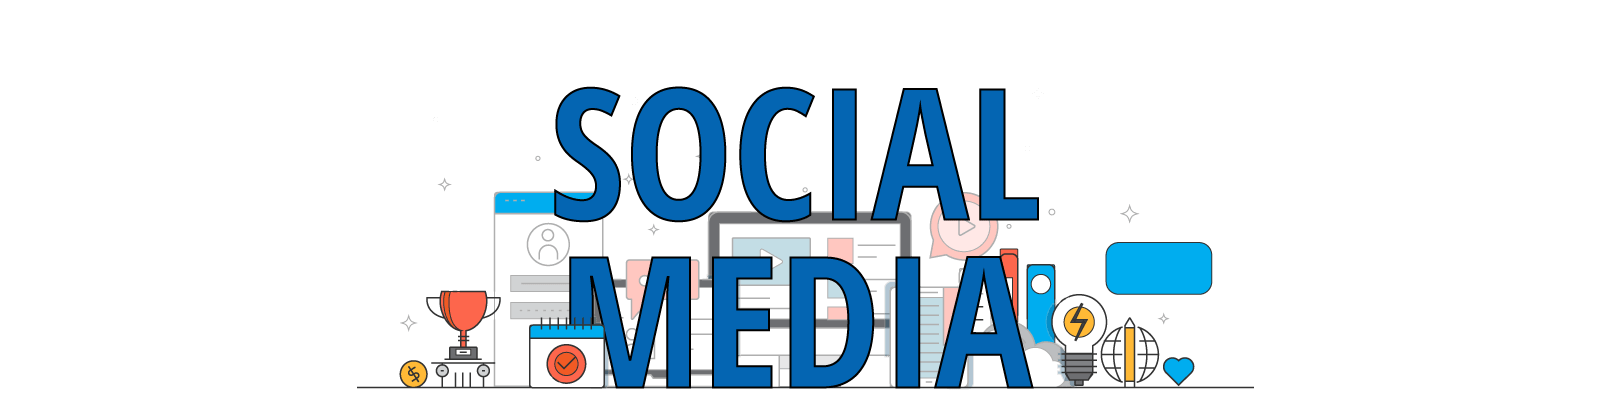 seek social social media header with transparent background